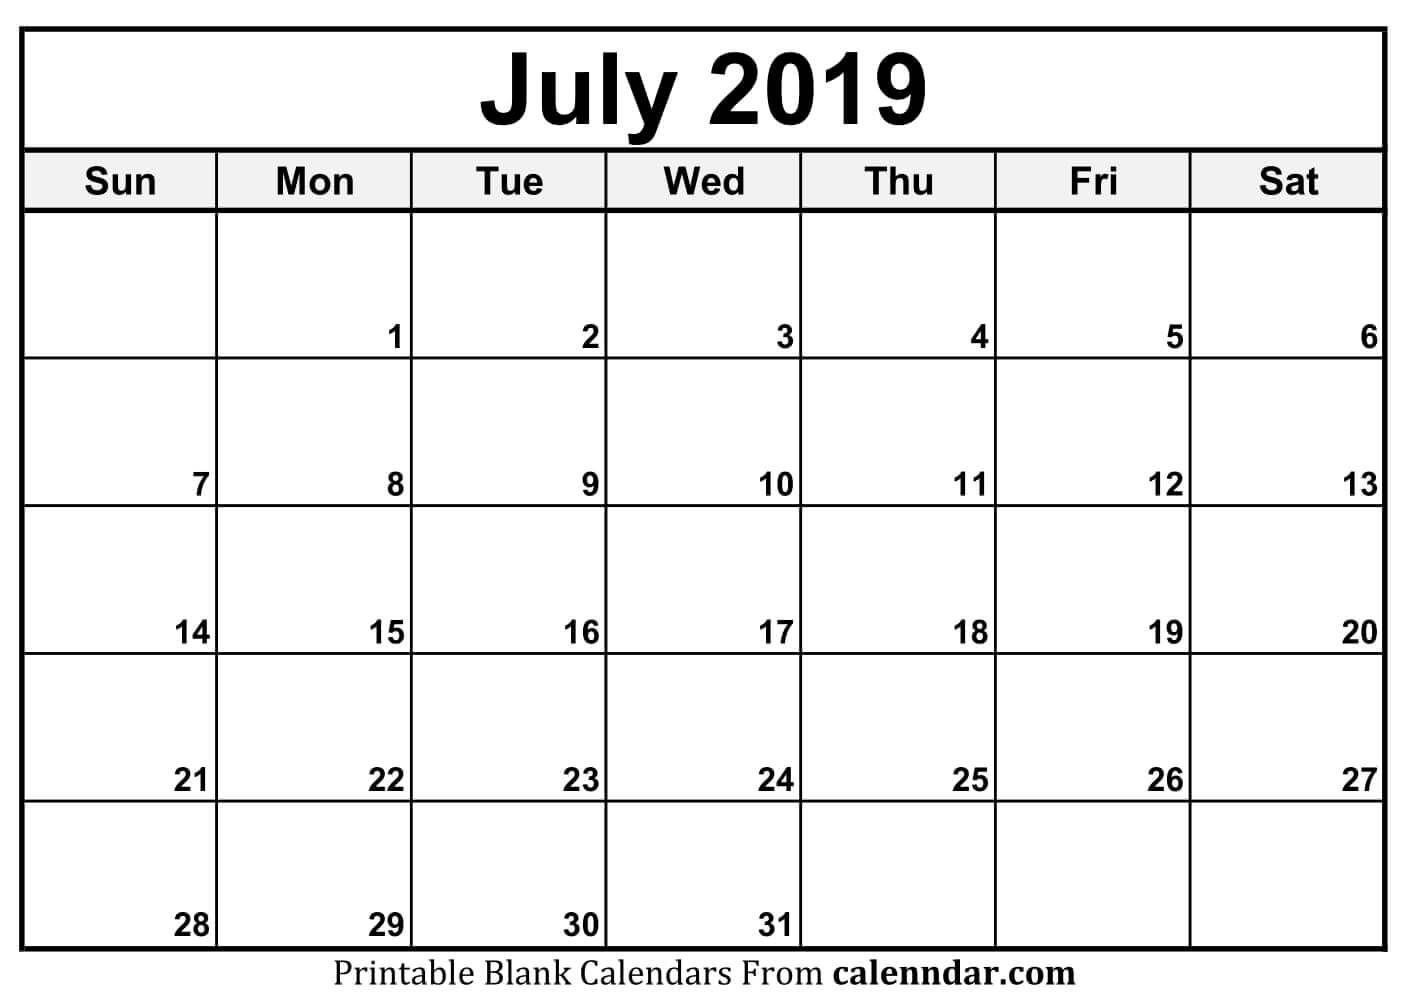 July 2019 Calendar Calendar Printables Printable Calendar